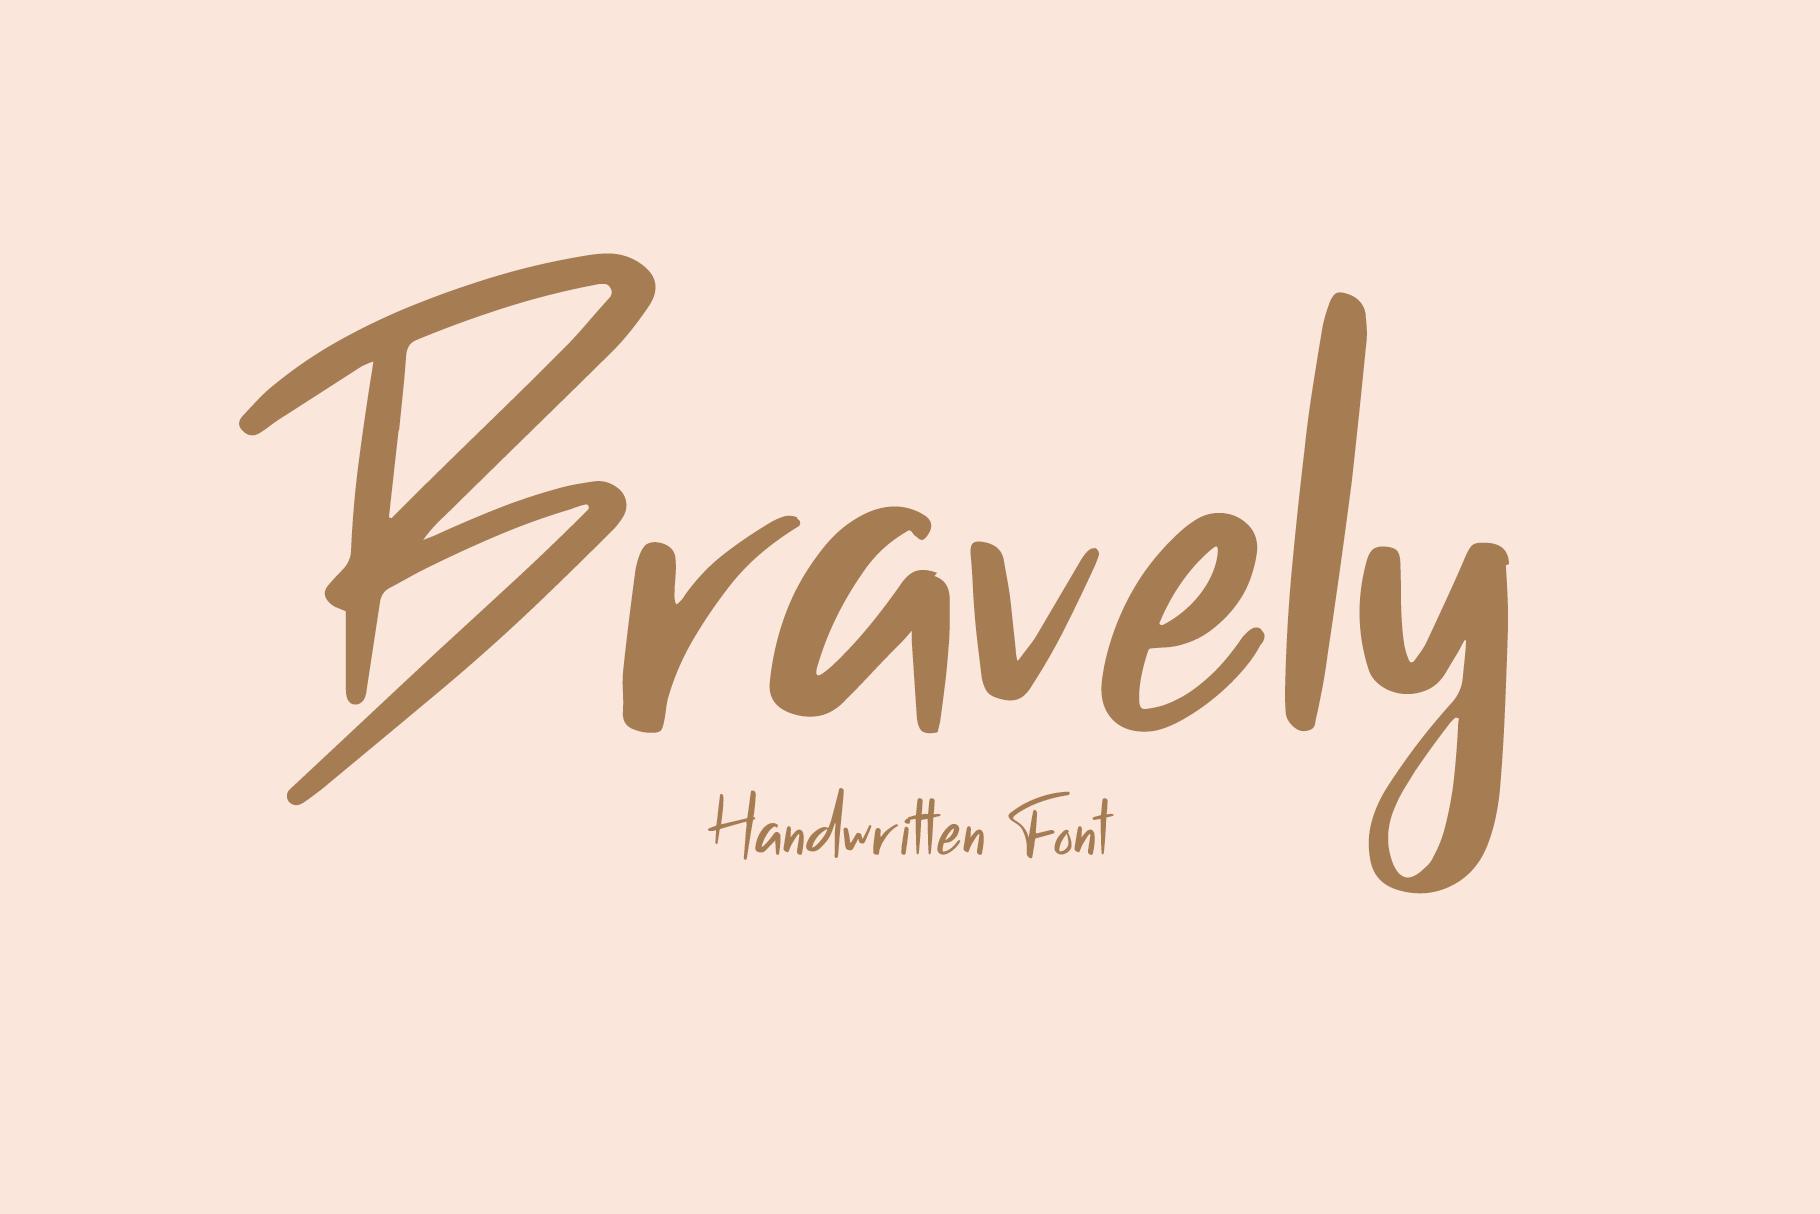 Bravely - Handwritten Font example image 2